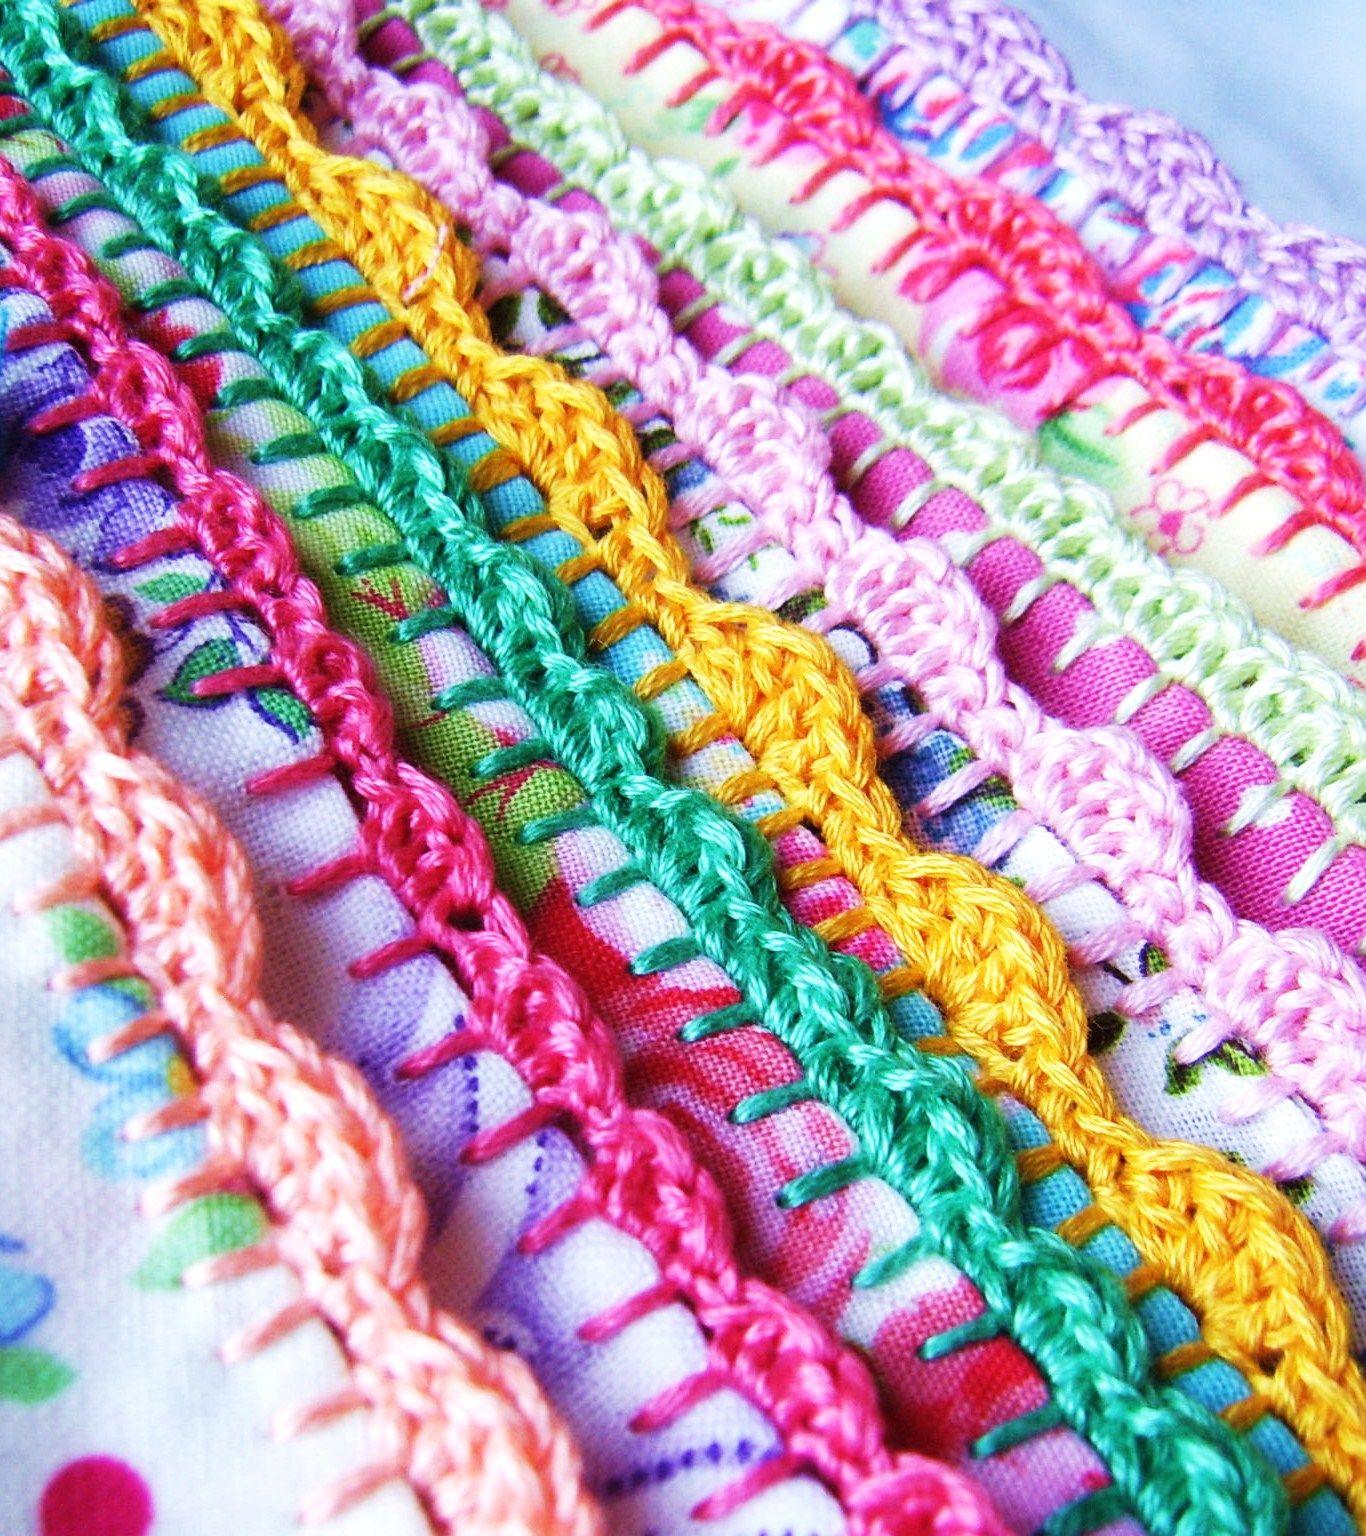 crochet edging for baby blankets or pillow cases